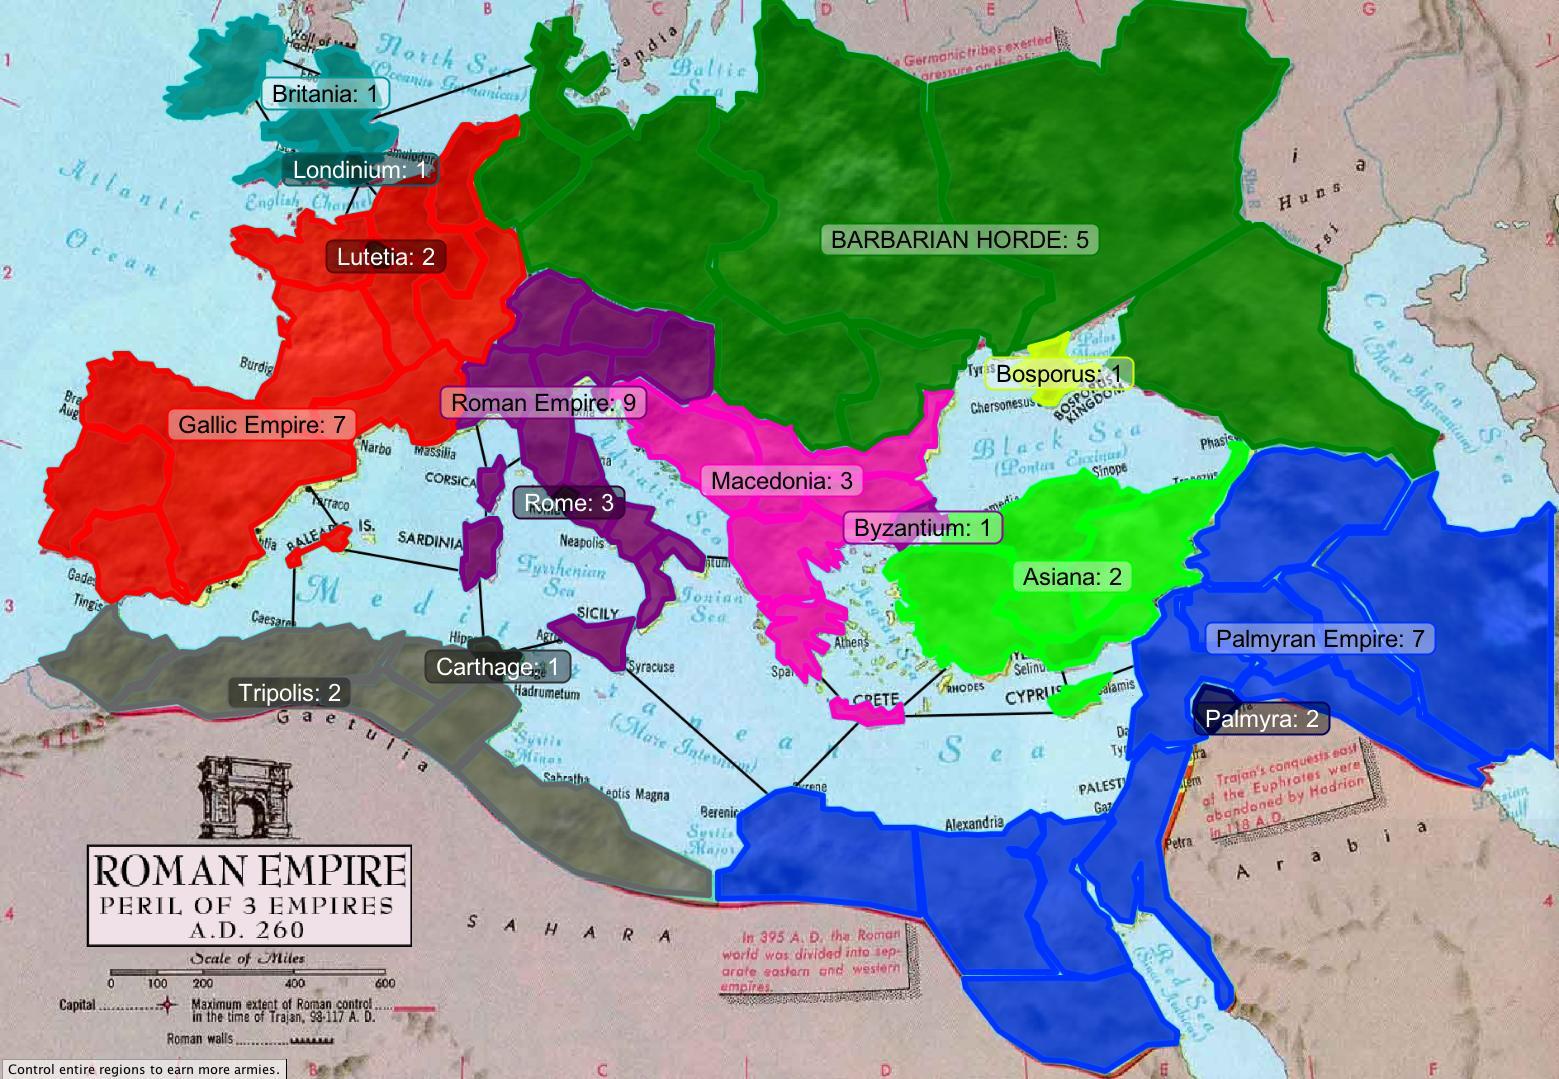 SYMBOLS  KINGDOMS OF THE WORLD